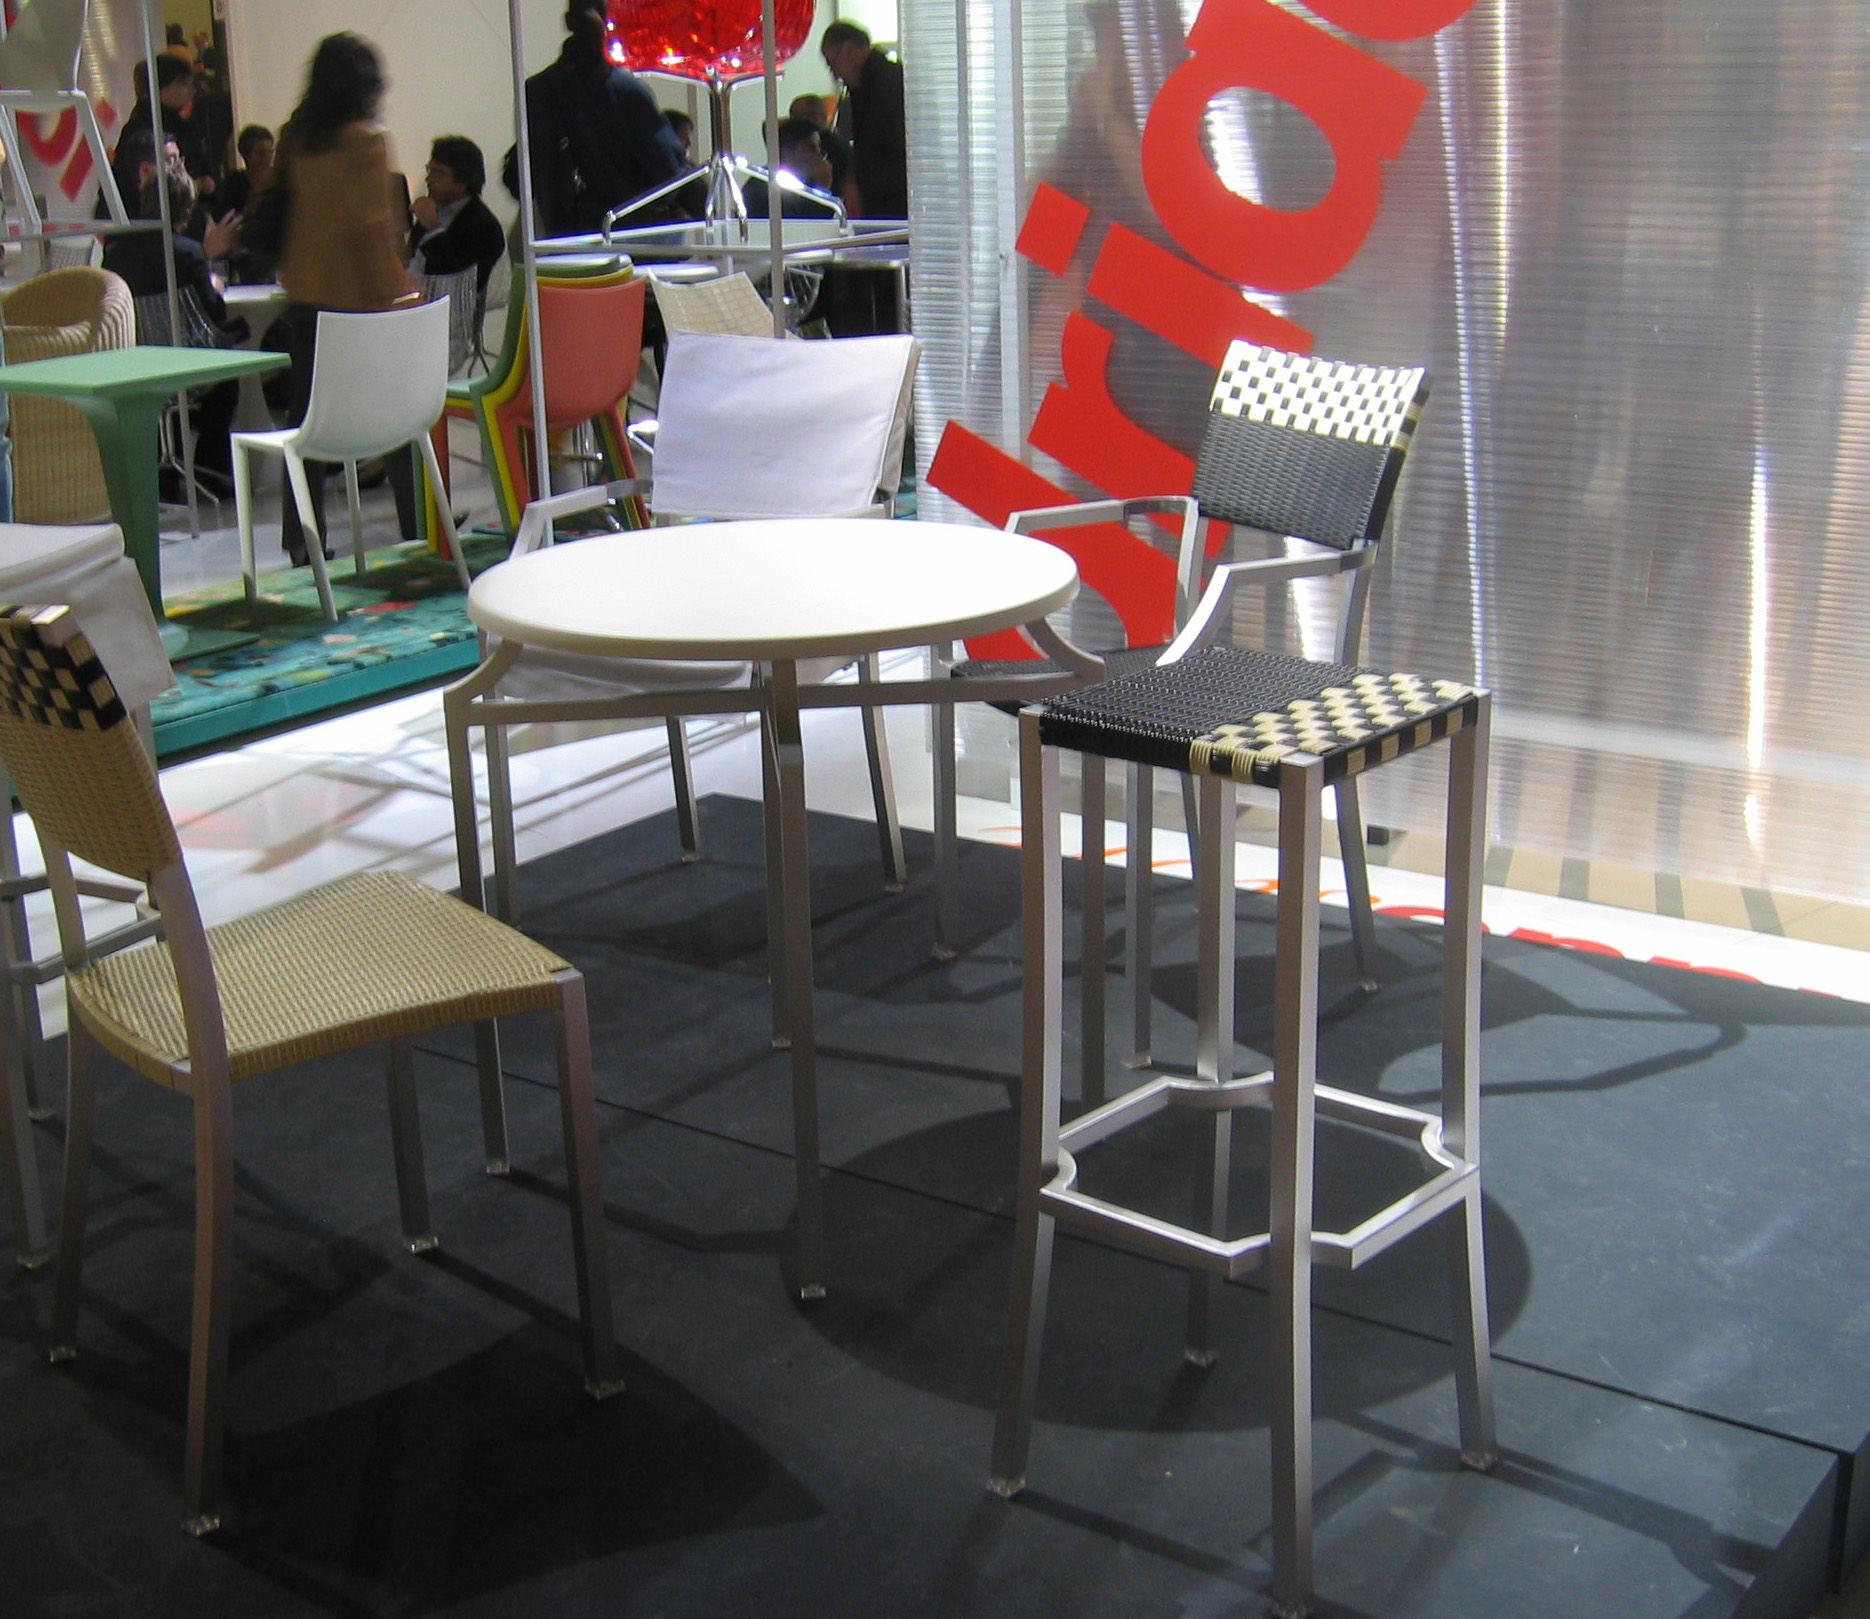 One cafe 39 bar stool h 75 cm ivory black by driade - Cafe driade ...